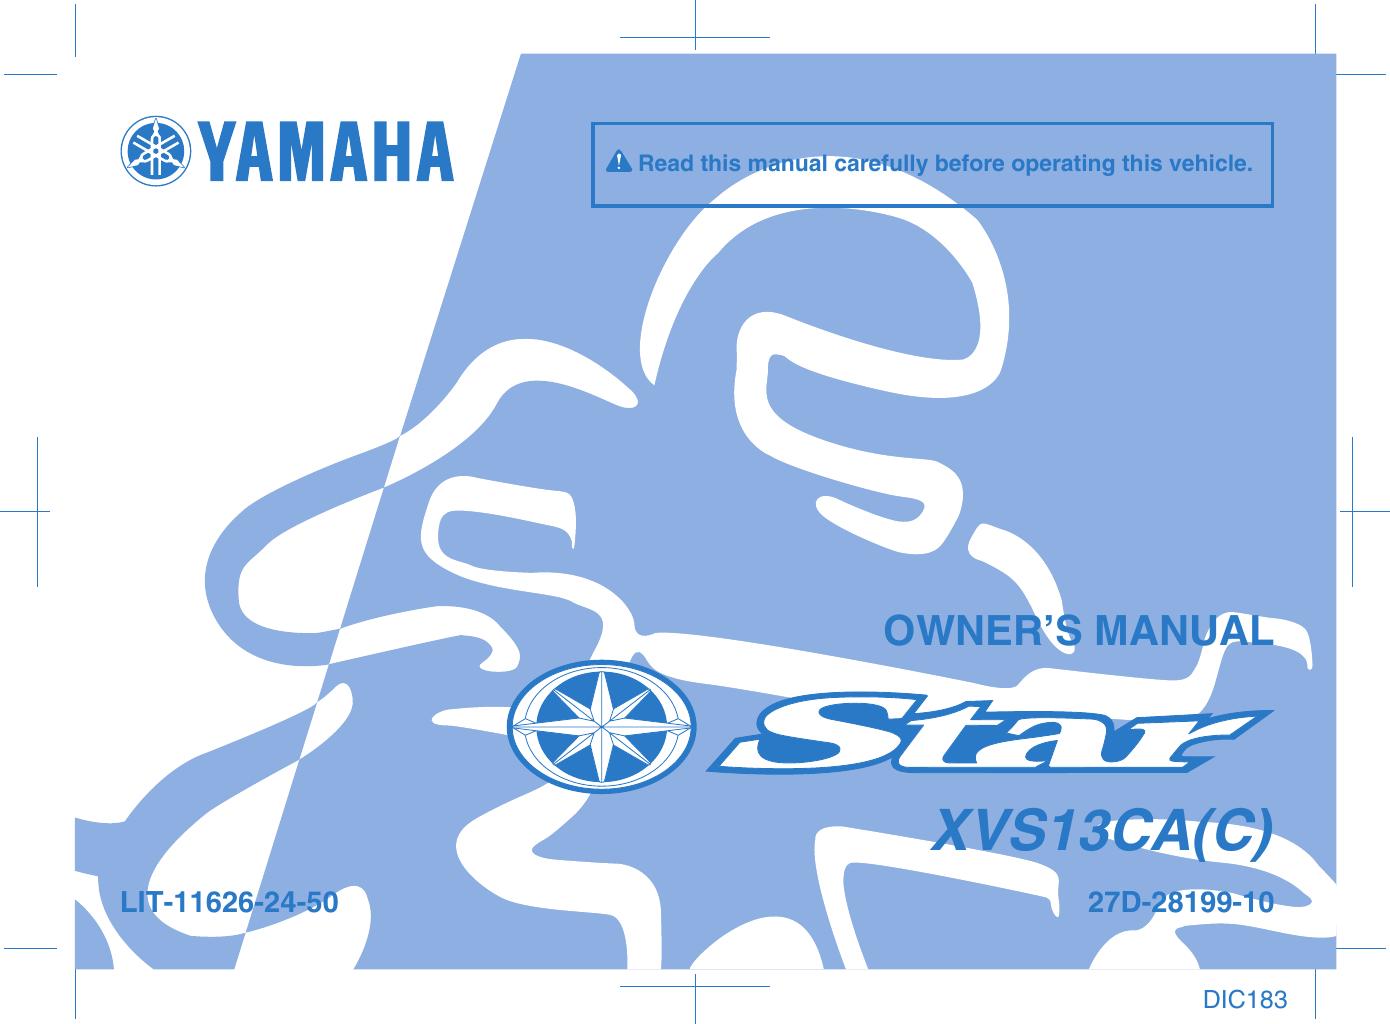 Yamaha 2011 Stryker Owners Manual